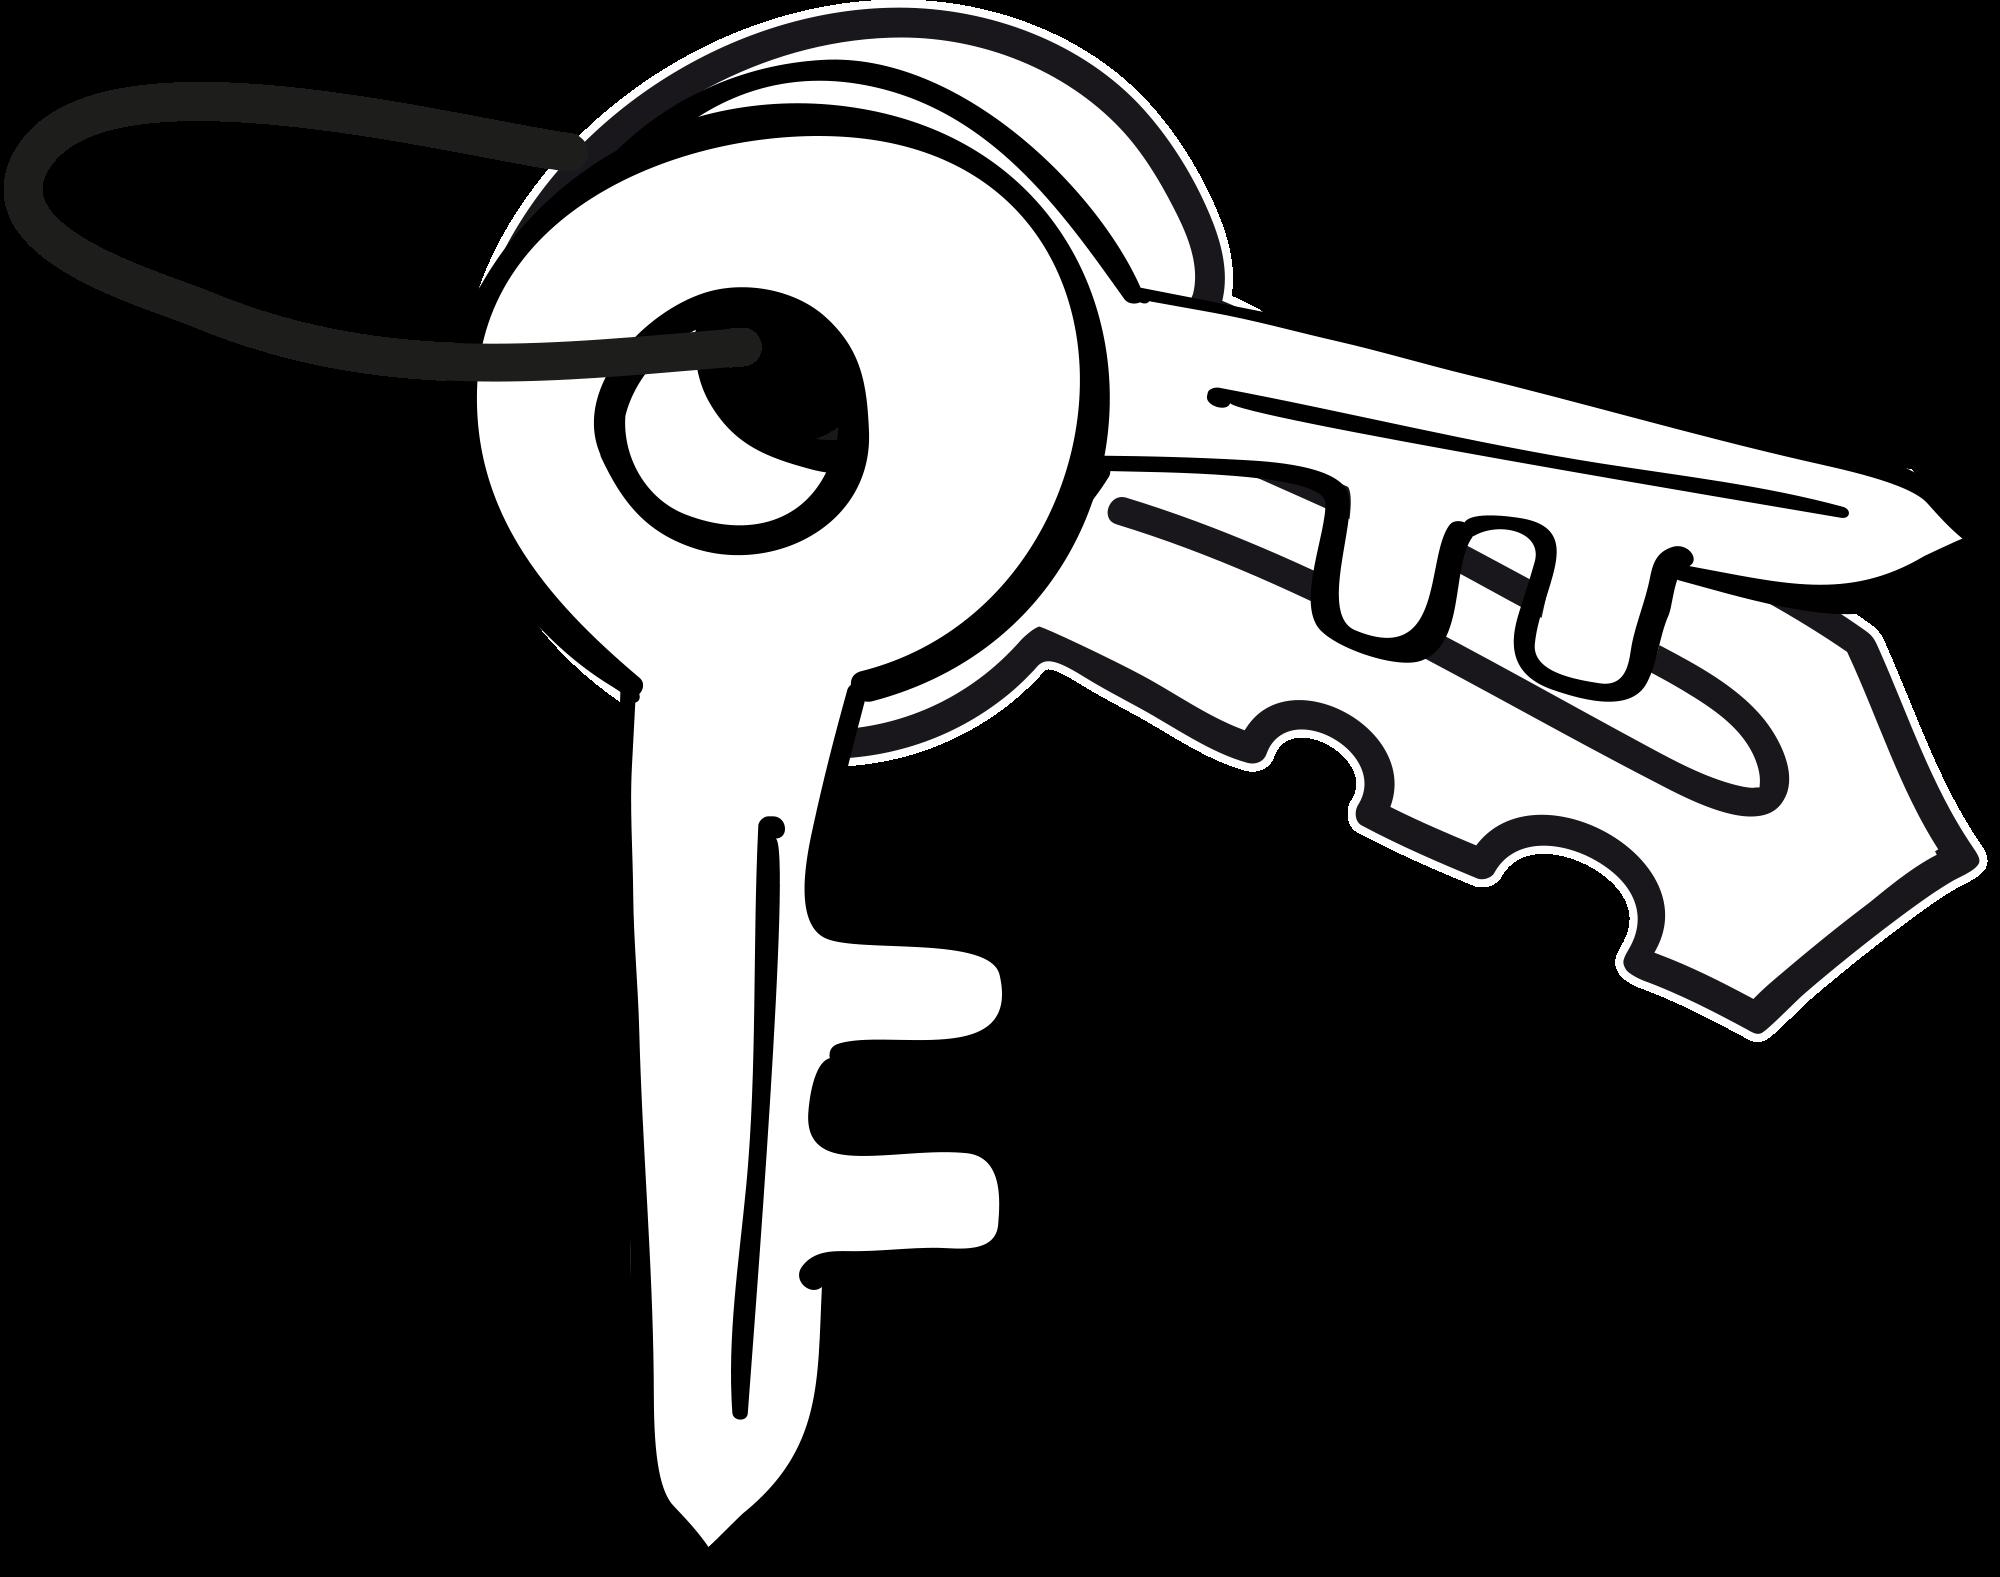 Tecknad nyckelknippa